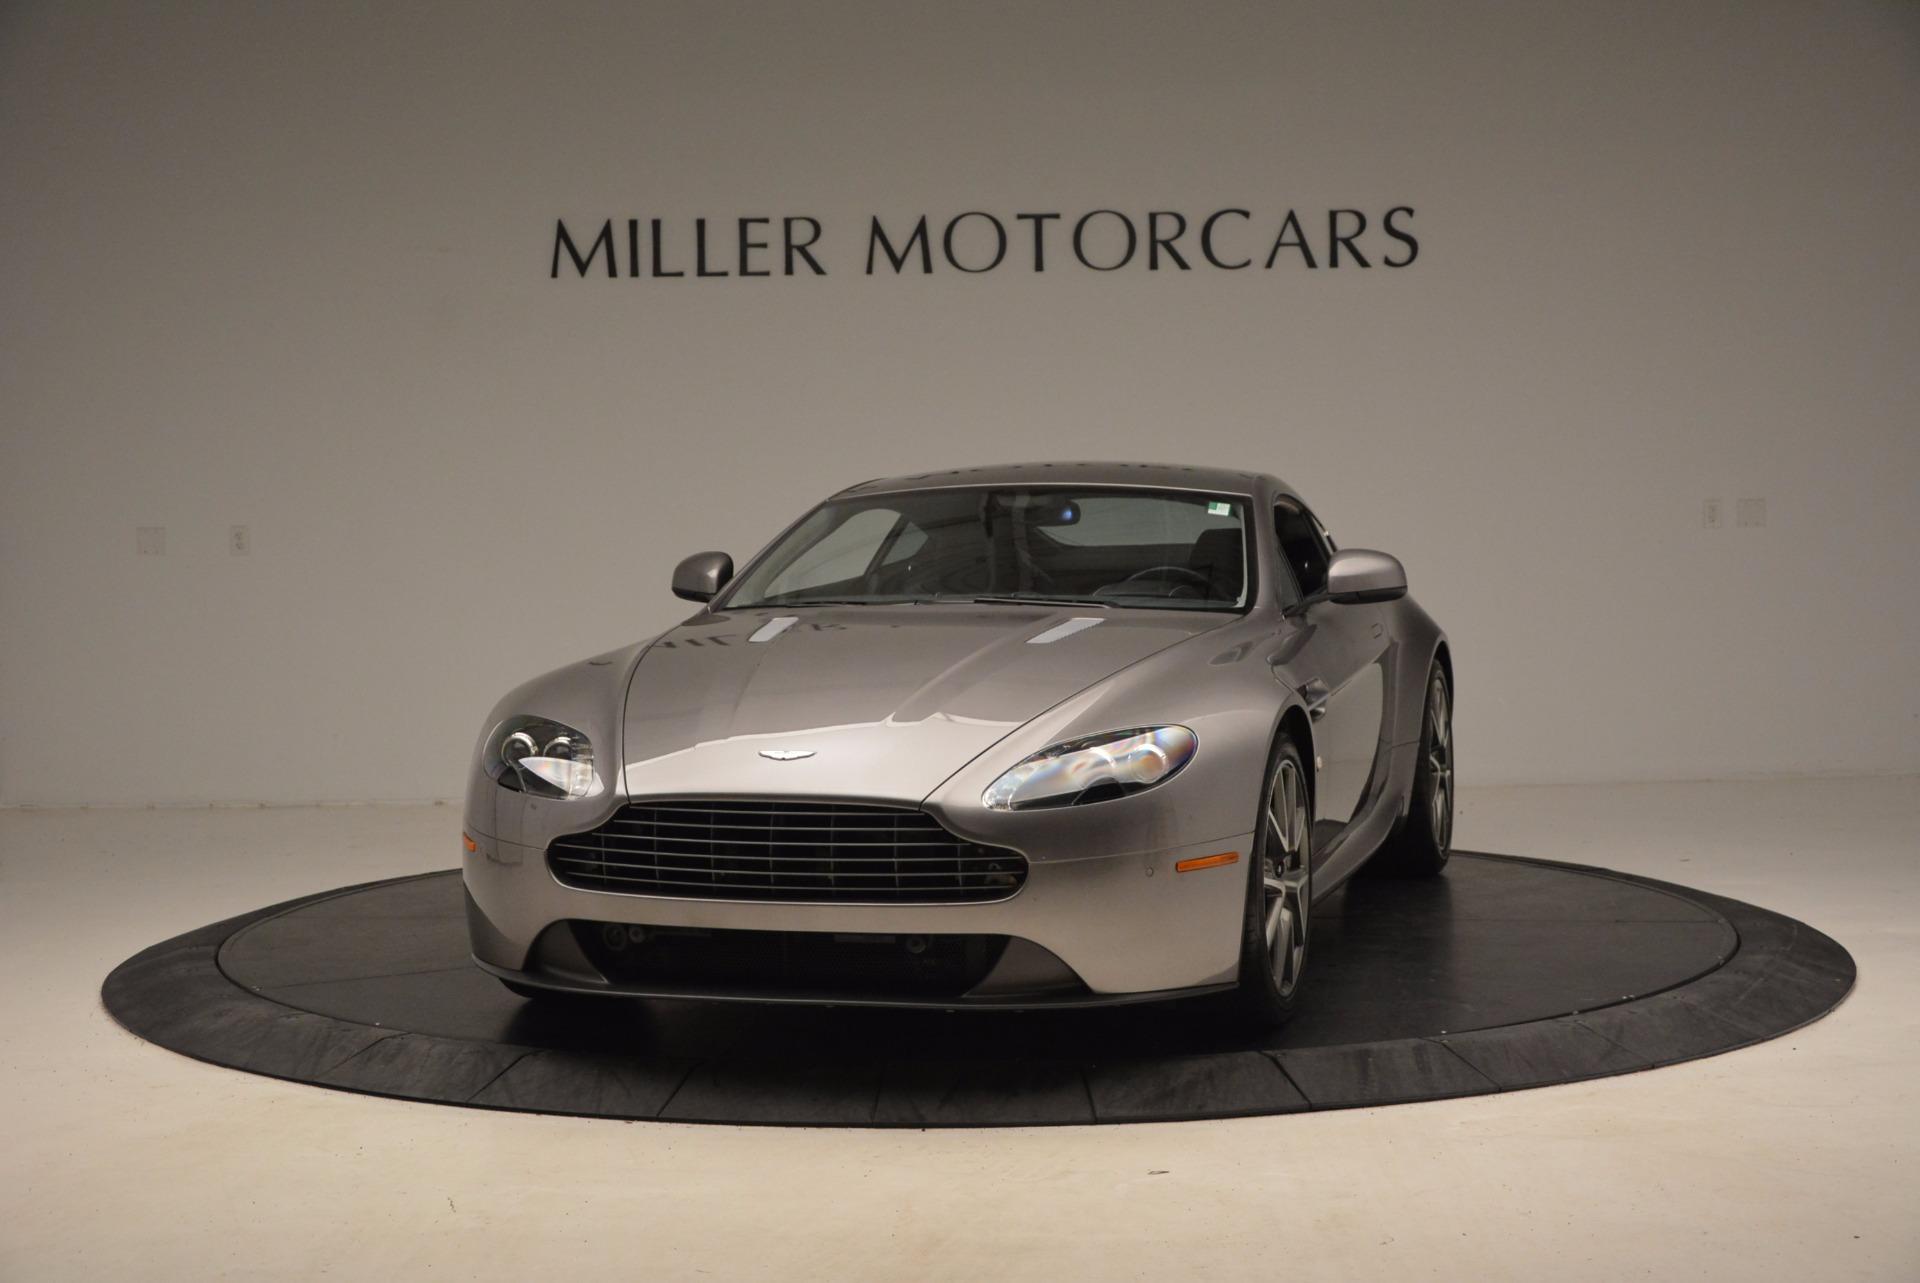 Used 2012 Aston Martin V8 Vantage  For Sale In Greenwich, CT. Alfa Romeo of Greenwich, 7263 1497_main